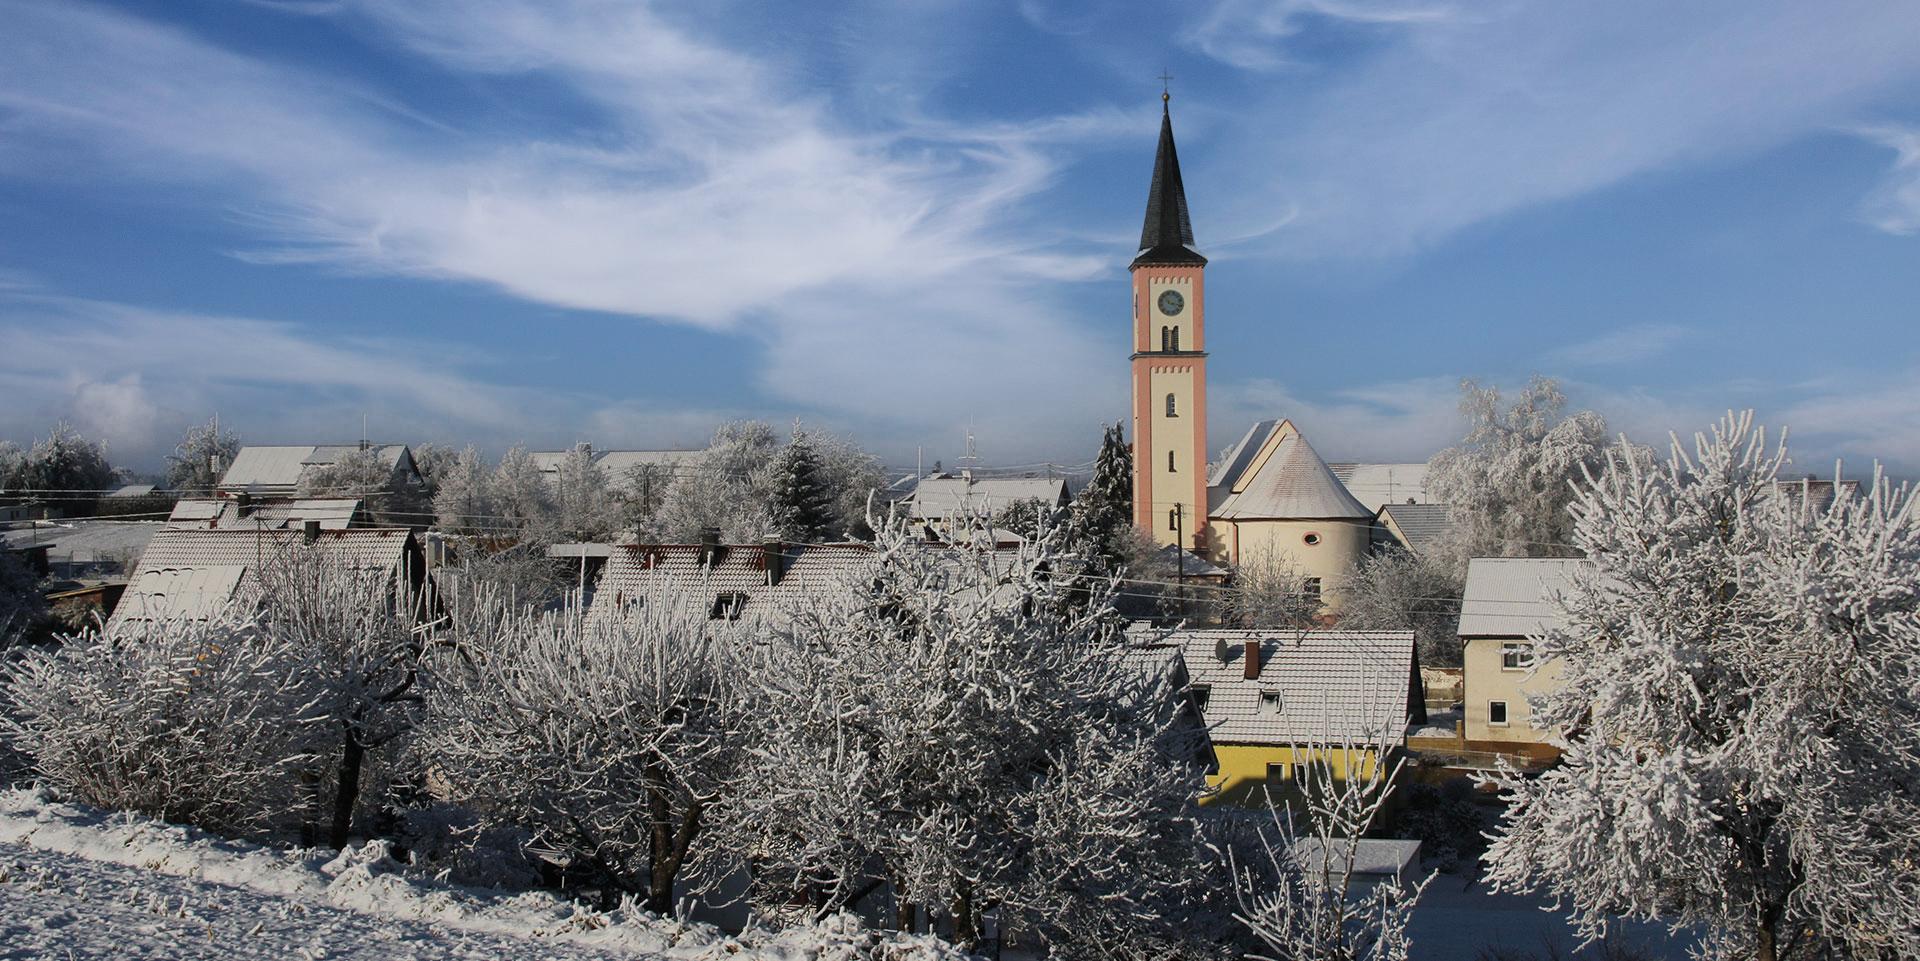 Wetter Attenweiler